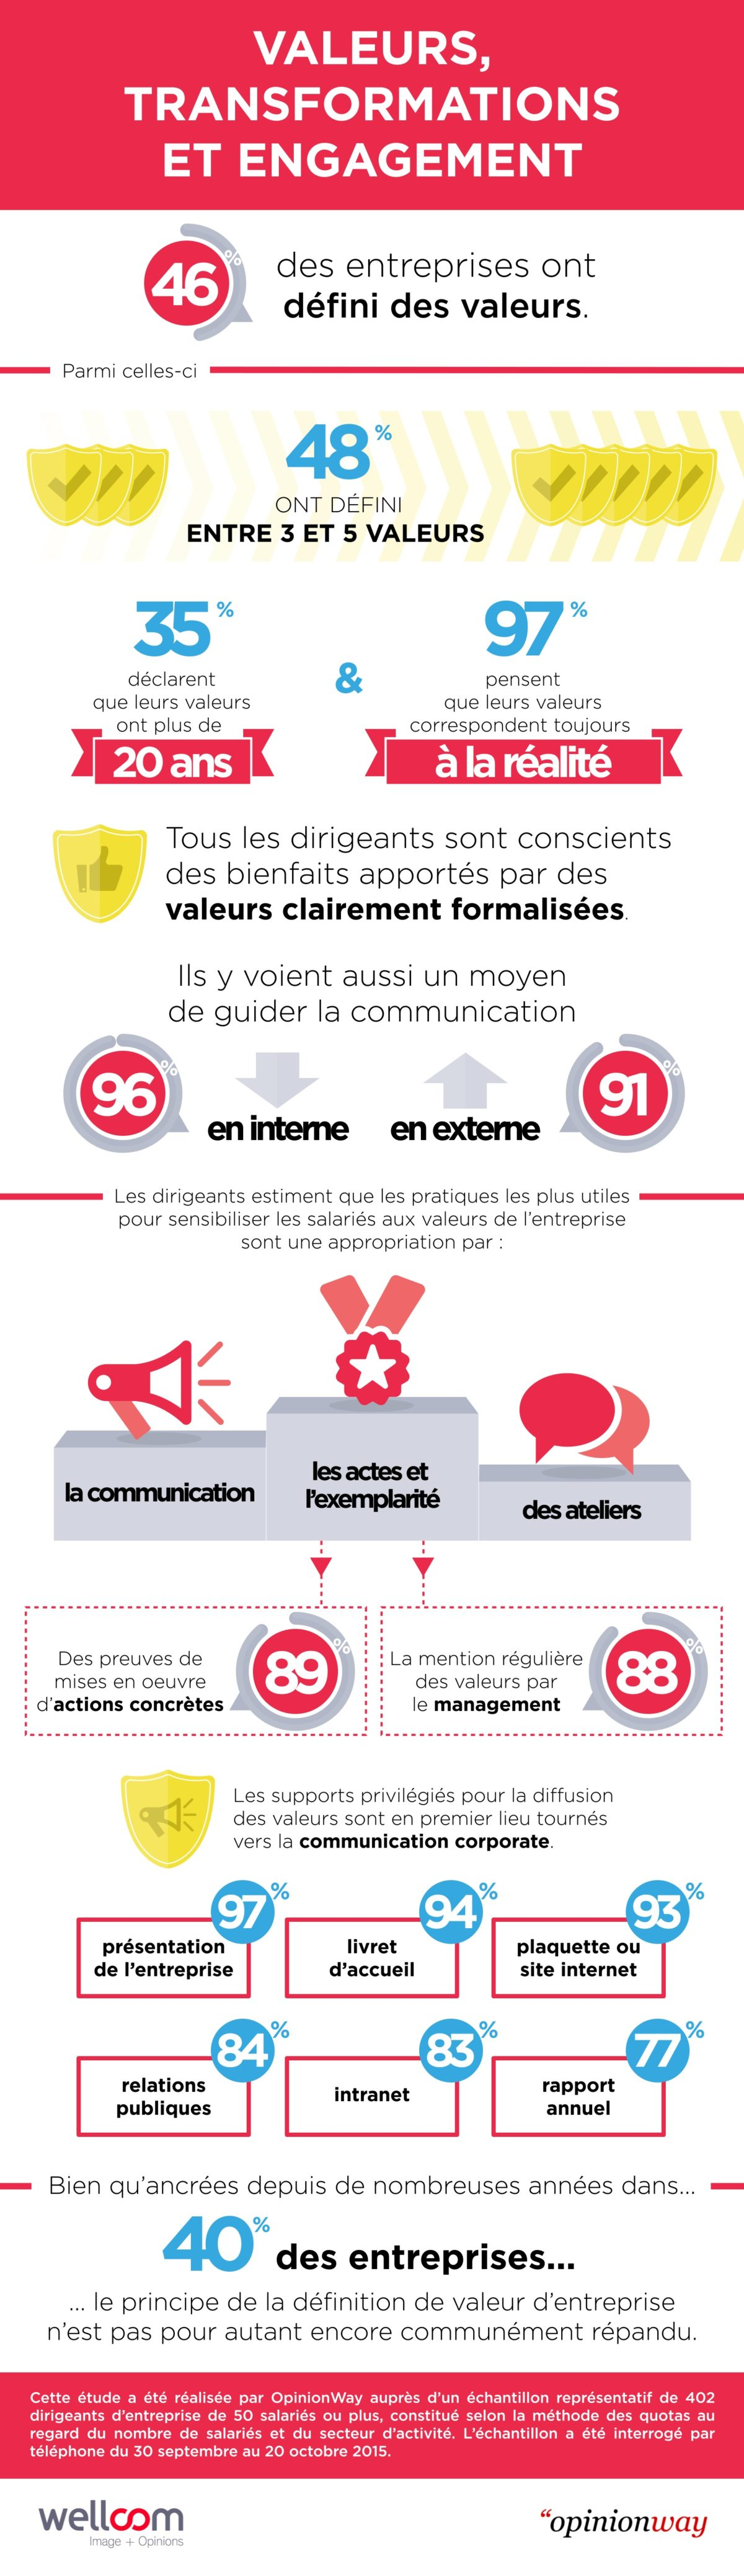 Infographie Wellcom Valeurs, transformations et engagement